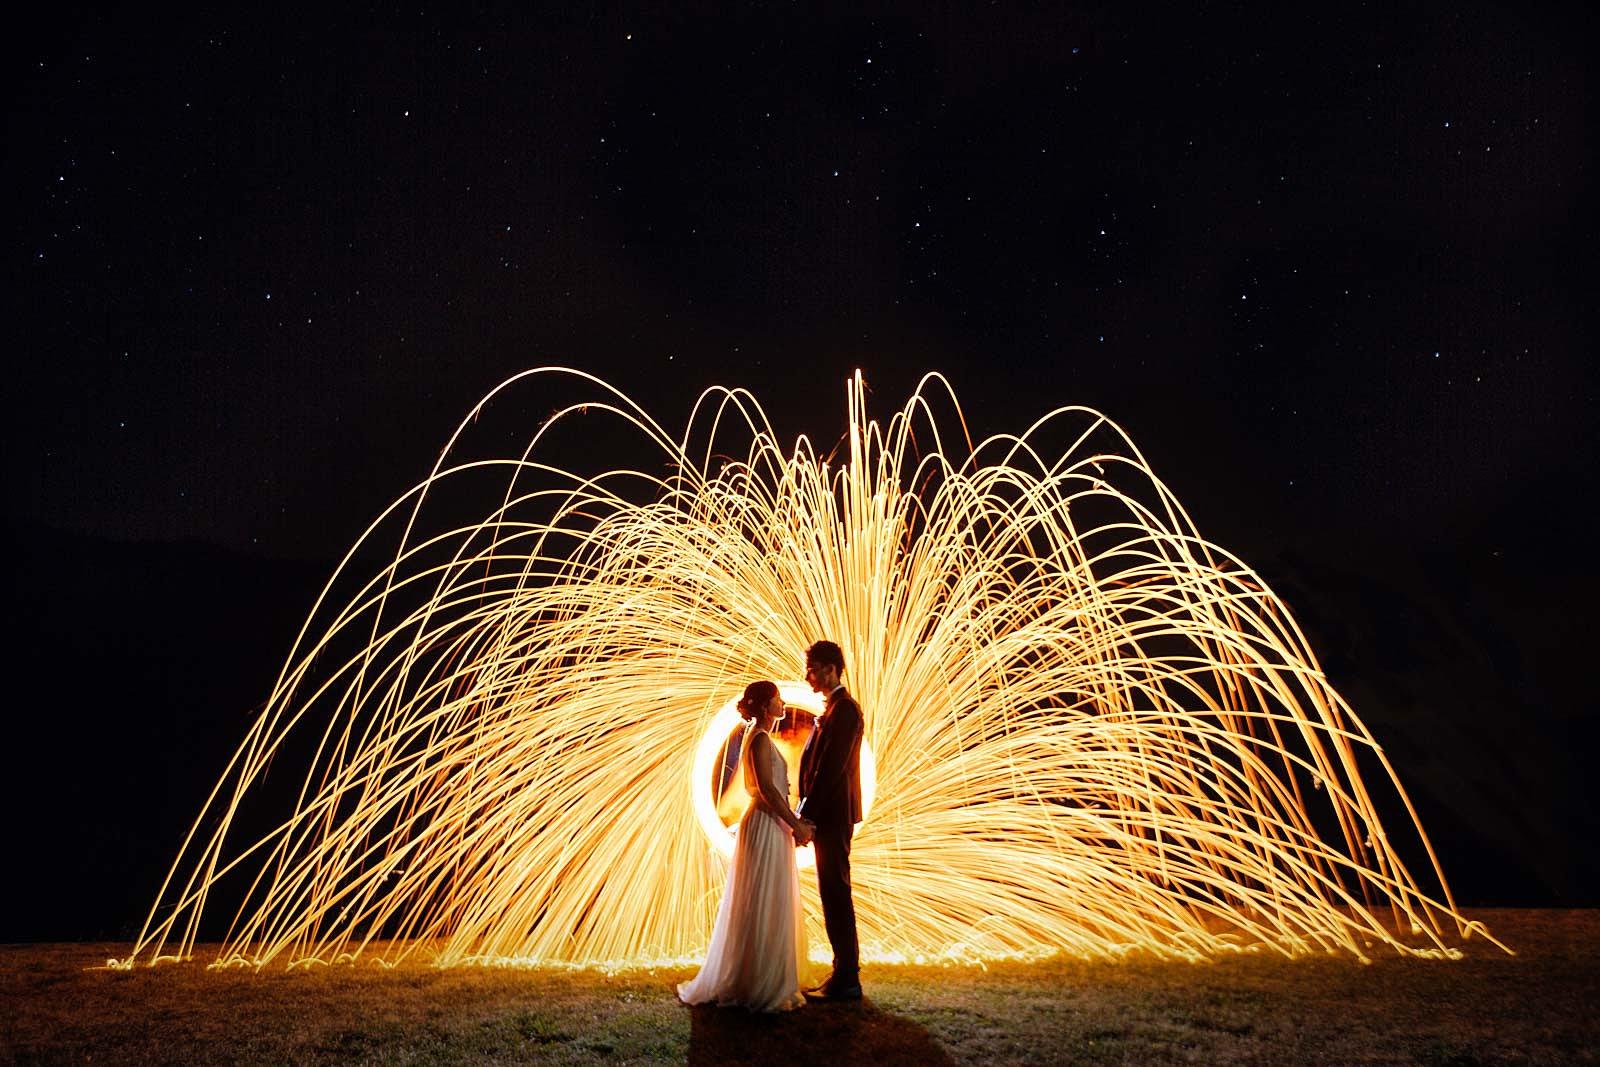 loric gonzalez photographe mariage perpignan photographe mariage perpignan - Photographe Mariage Perpignan